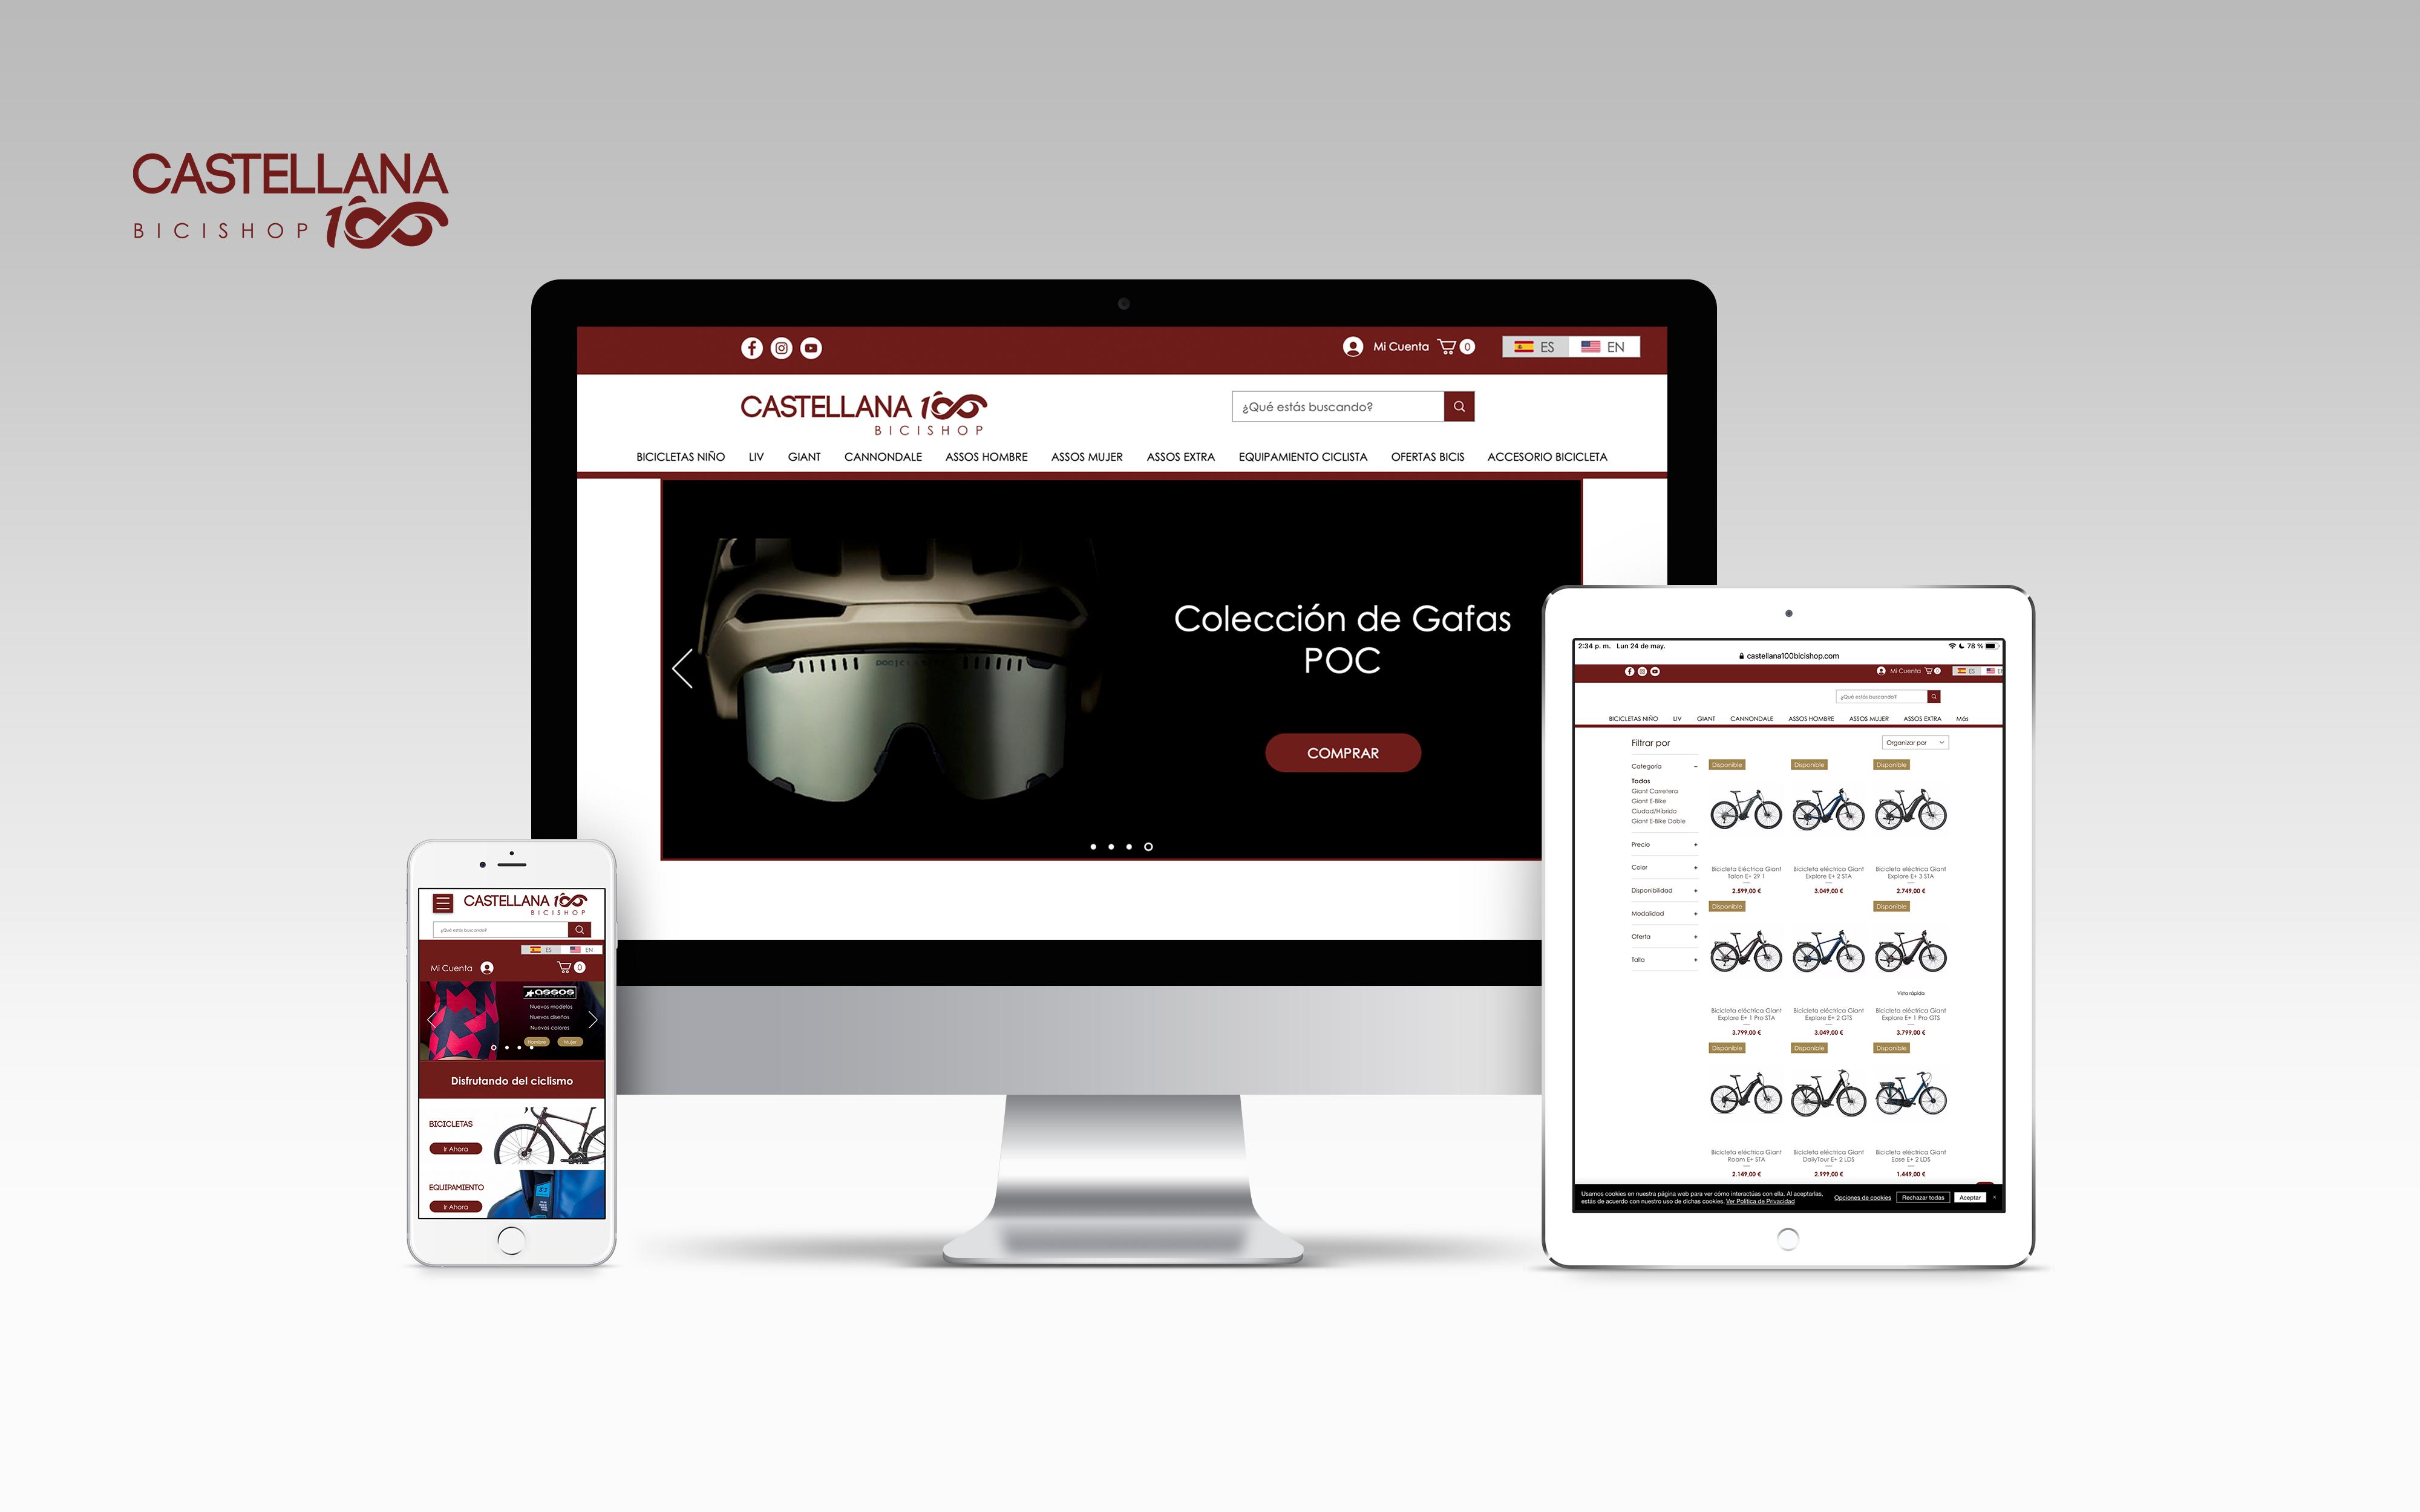 Castellana 100 Bicishop Ecommerce de ciclismo, Wix Store, páginas dinámica...